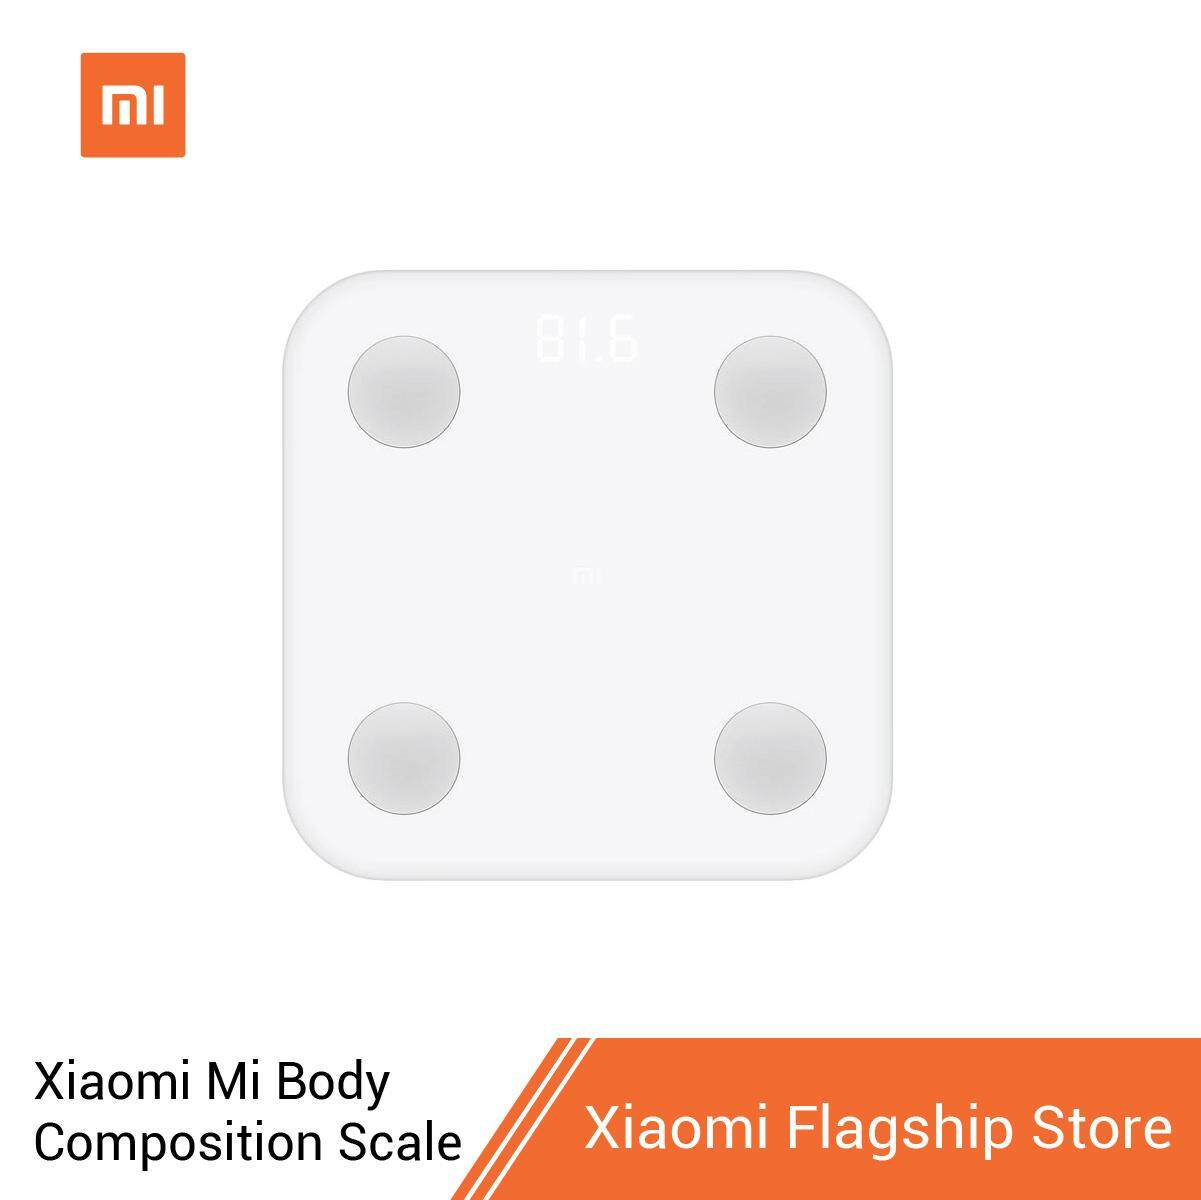 Mi Body Composition Scale By Xiaomi Retail.